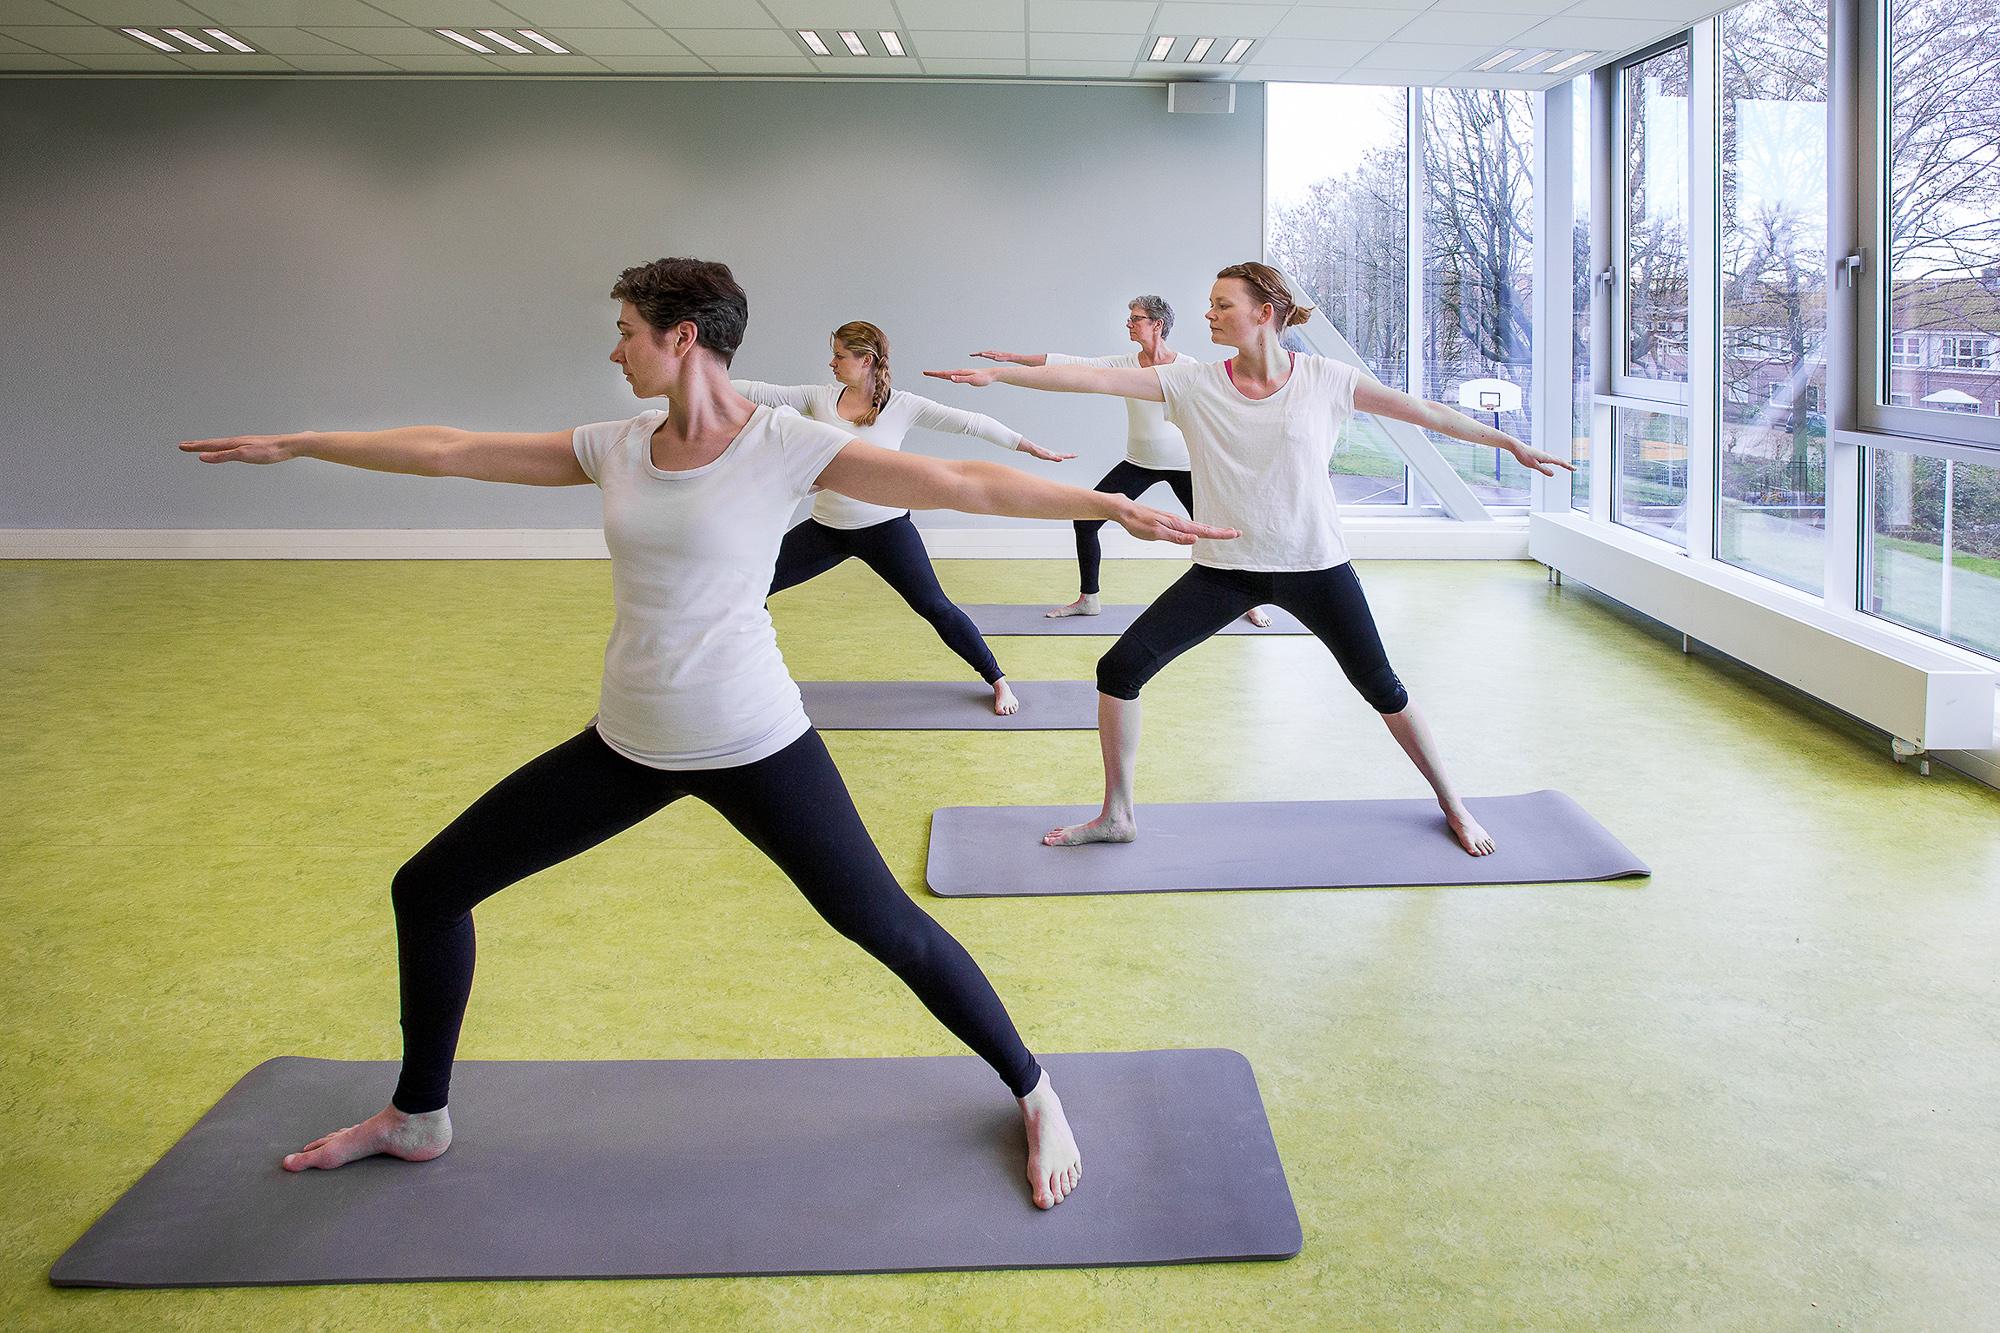 yoga zweverig, Tapas - Vurige inzet Yogalessen, Ondiep, Hatha yoga, Dananda